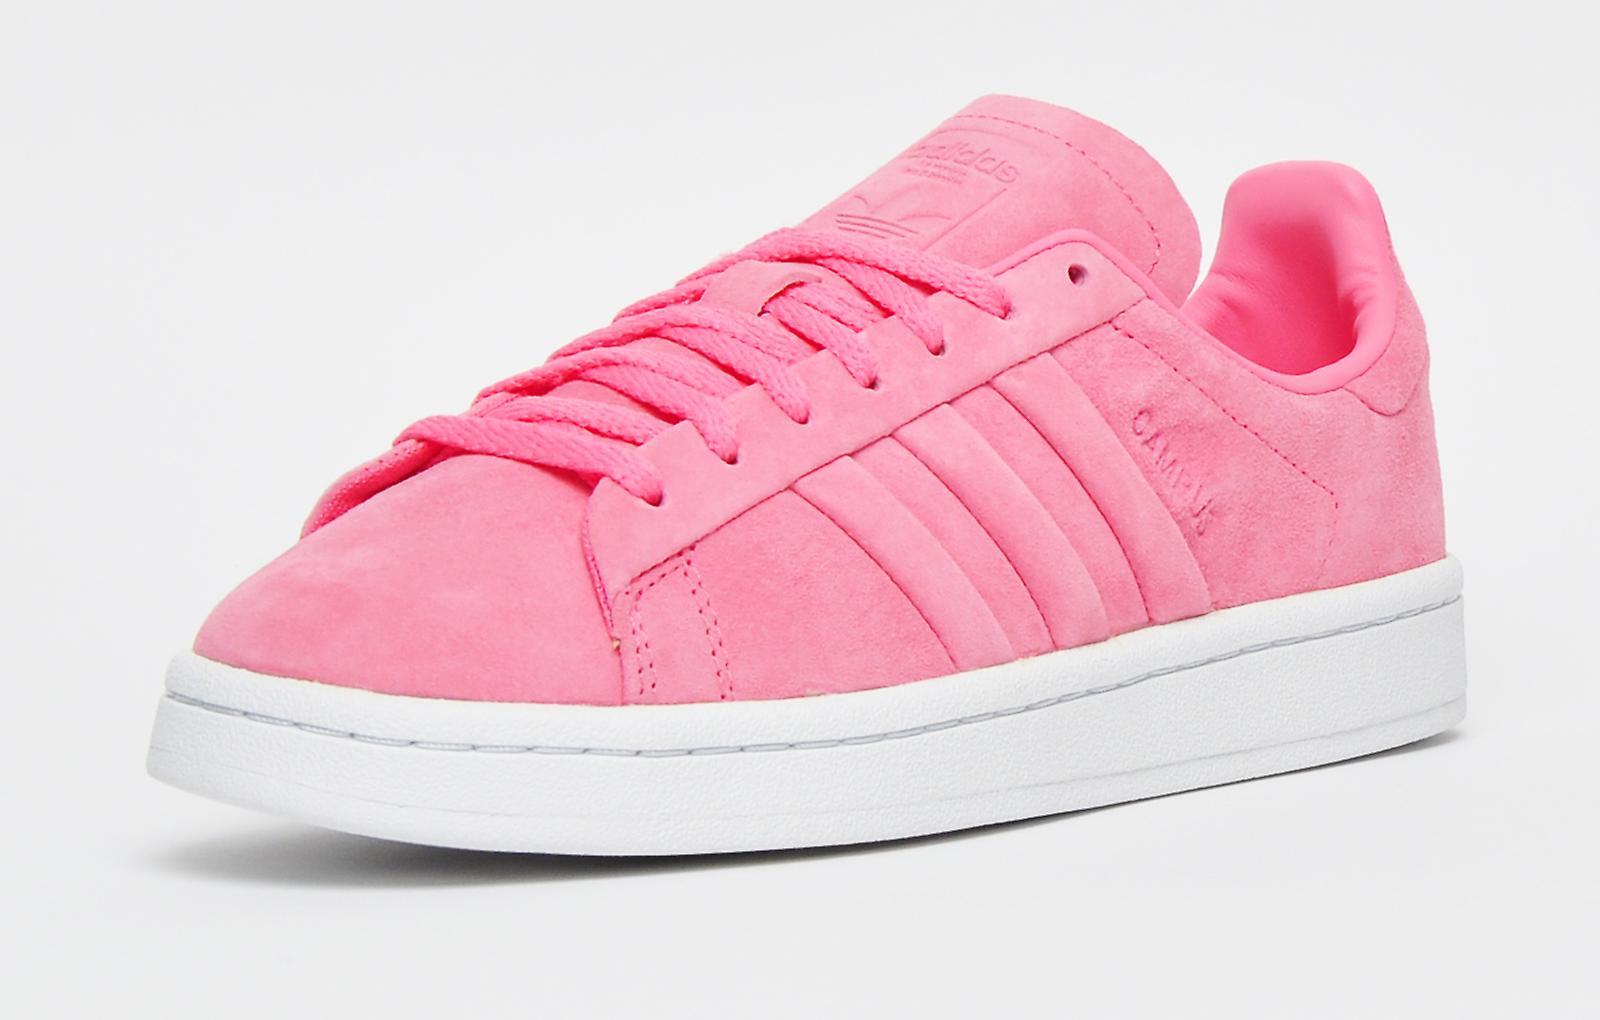 Adidas Originals Campus Stitch and Turn Pink / White pmUNT